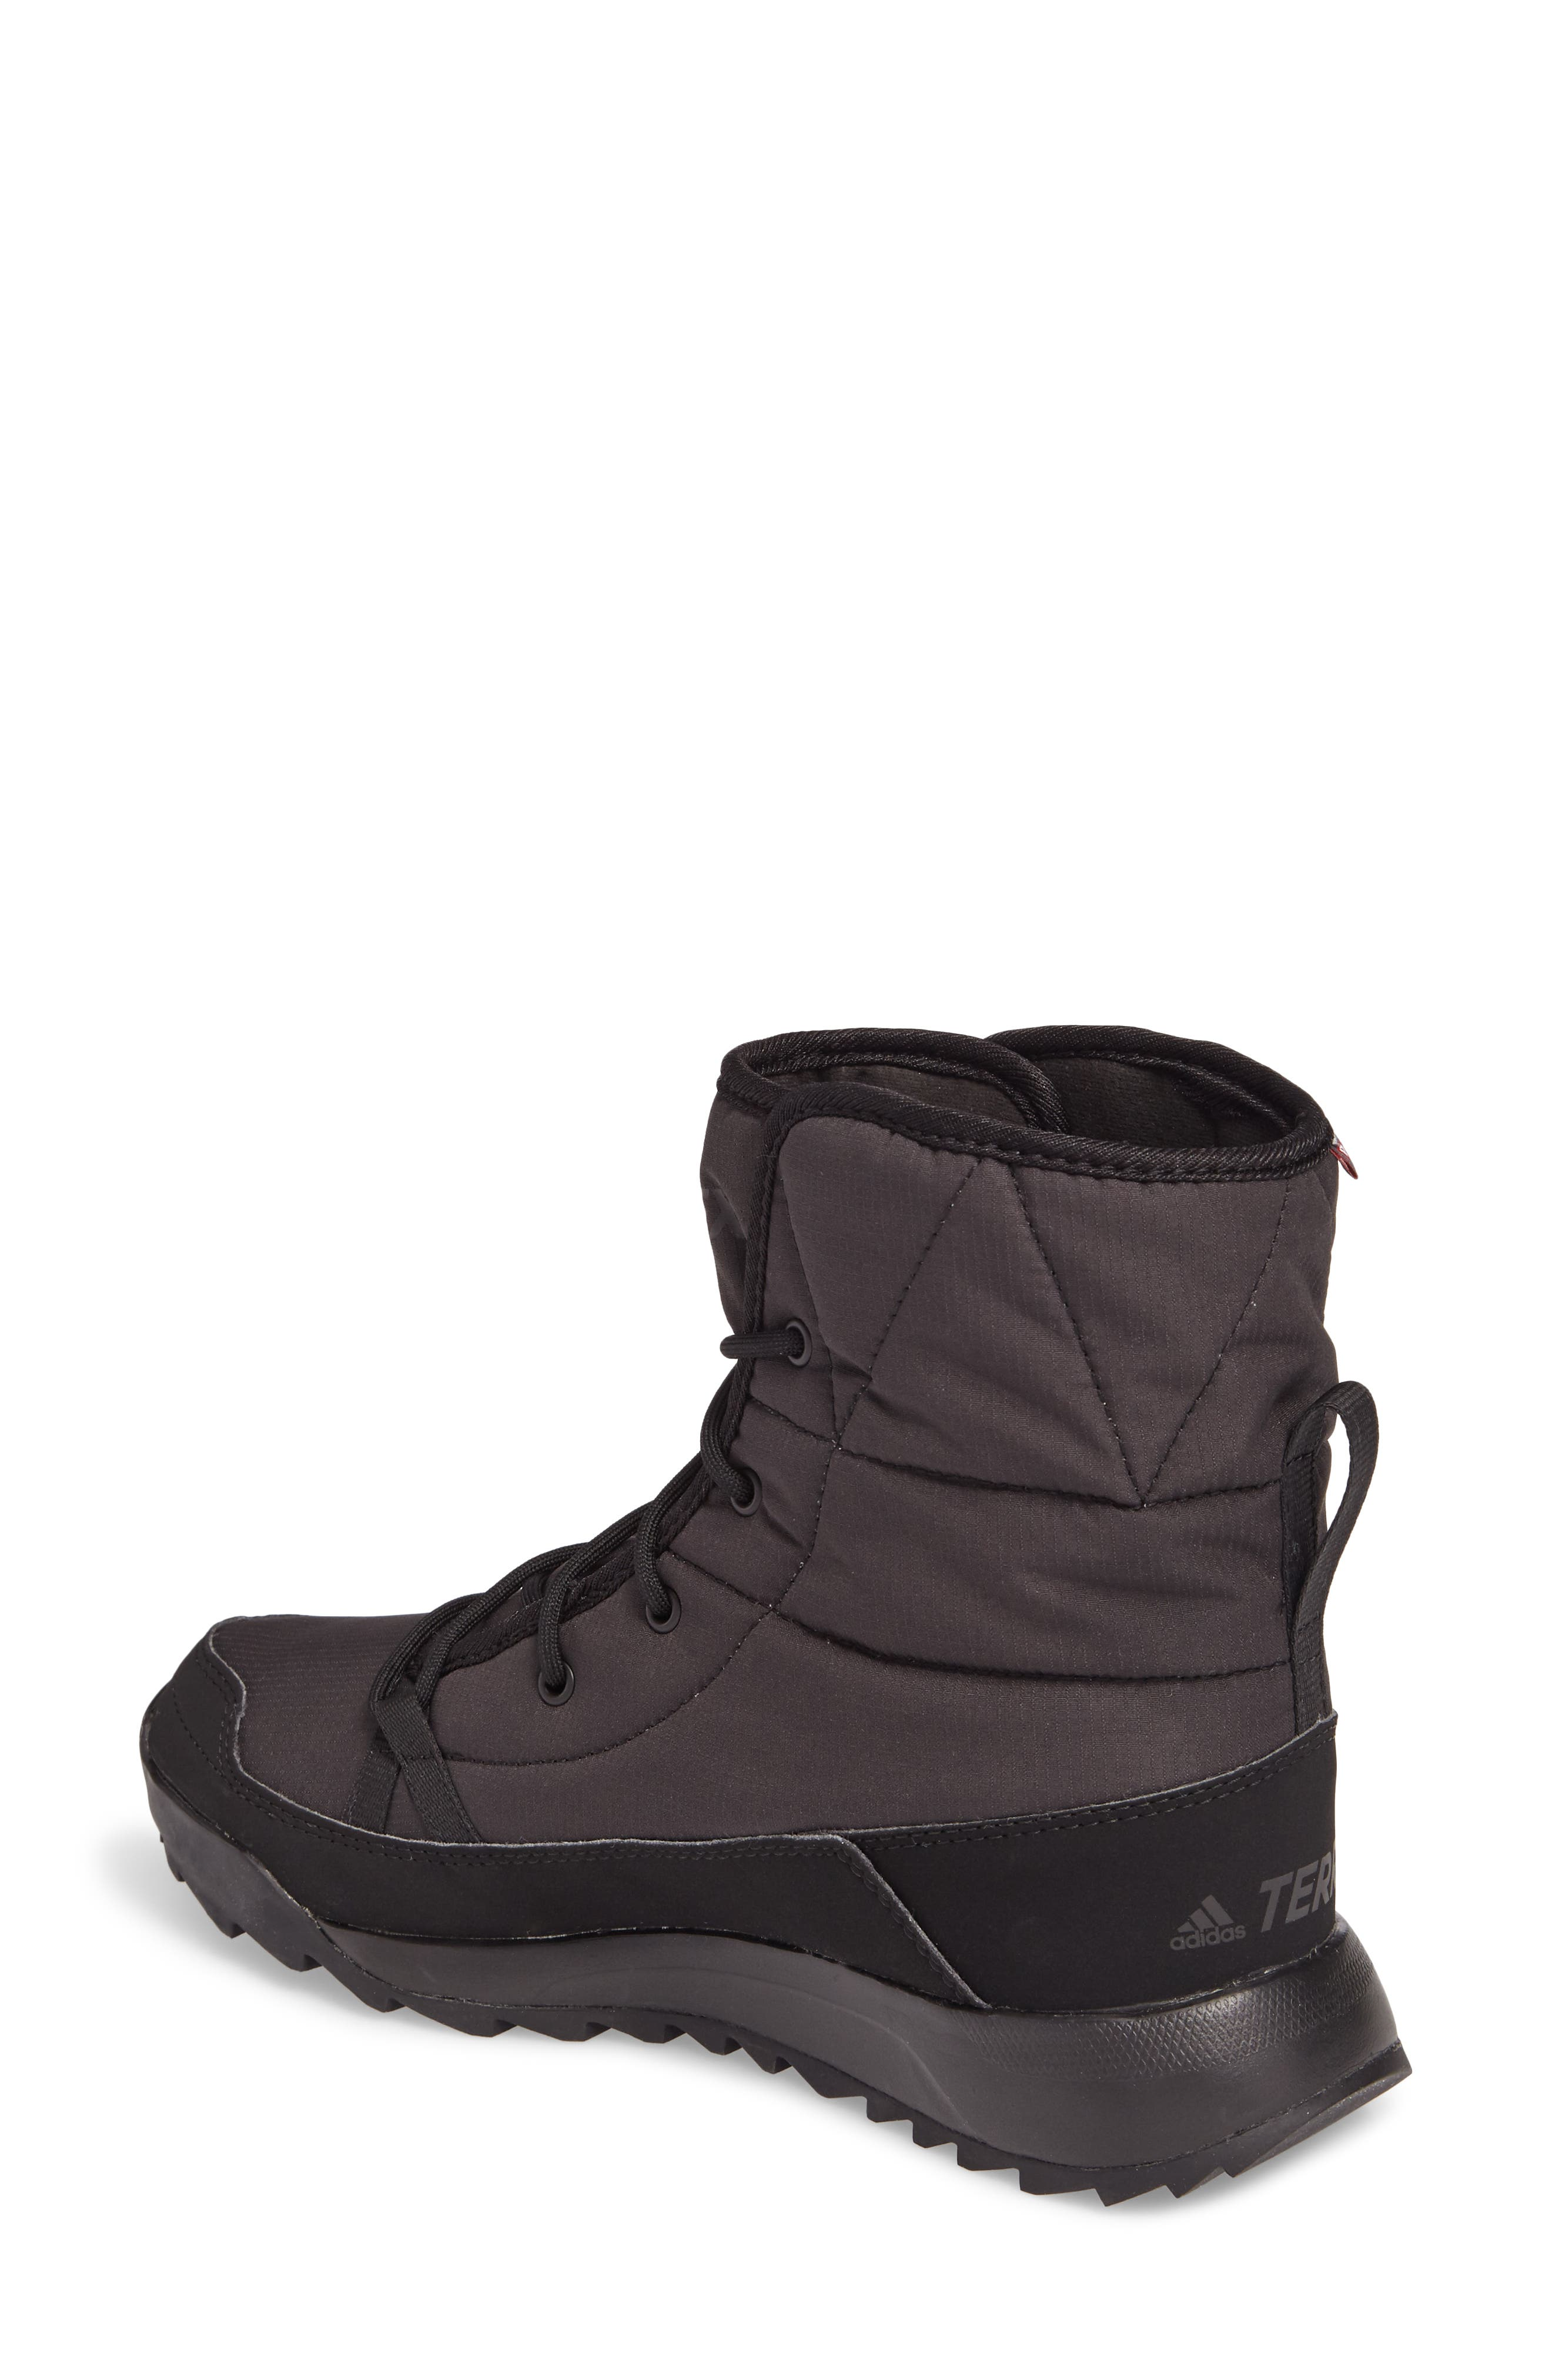 Terrex Choleah Waterproof Boot,                             Alternate thumbnail 2, color,                             001